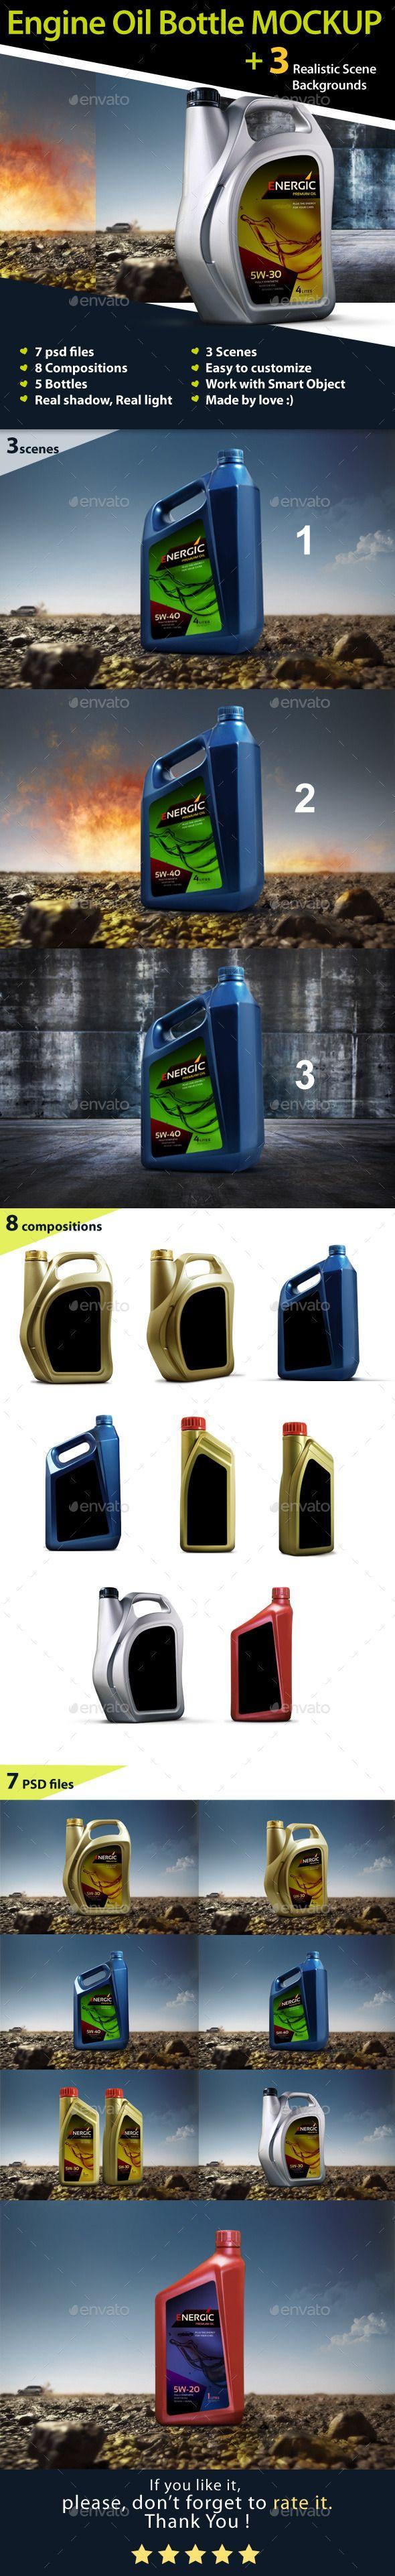 Engine Oil Bottle Mockup #design Download: http://graphicriver.net/item/engine-oil-bottle-mockup/12924533?ref=ksioks